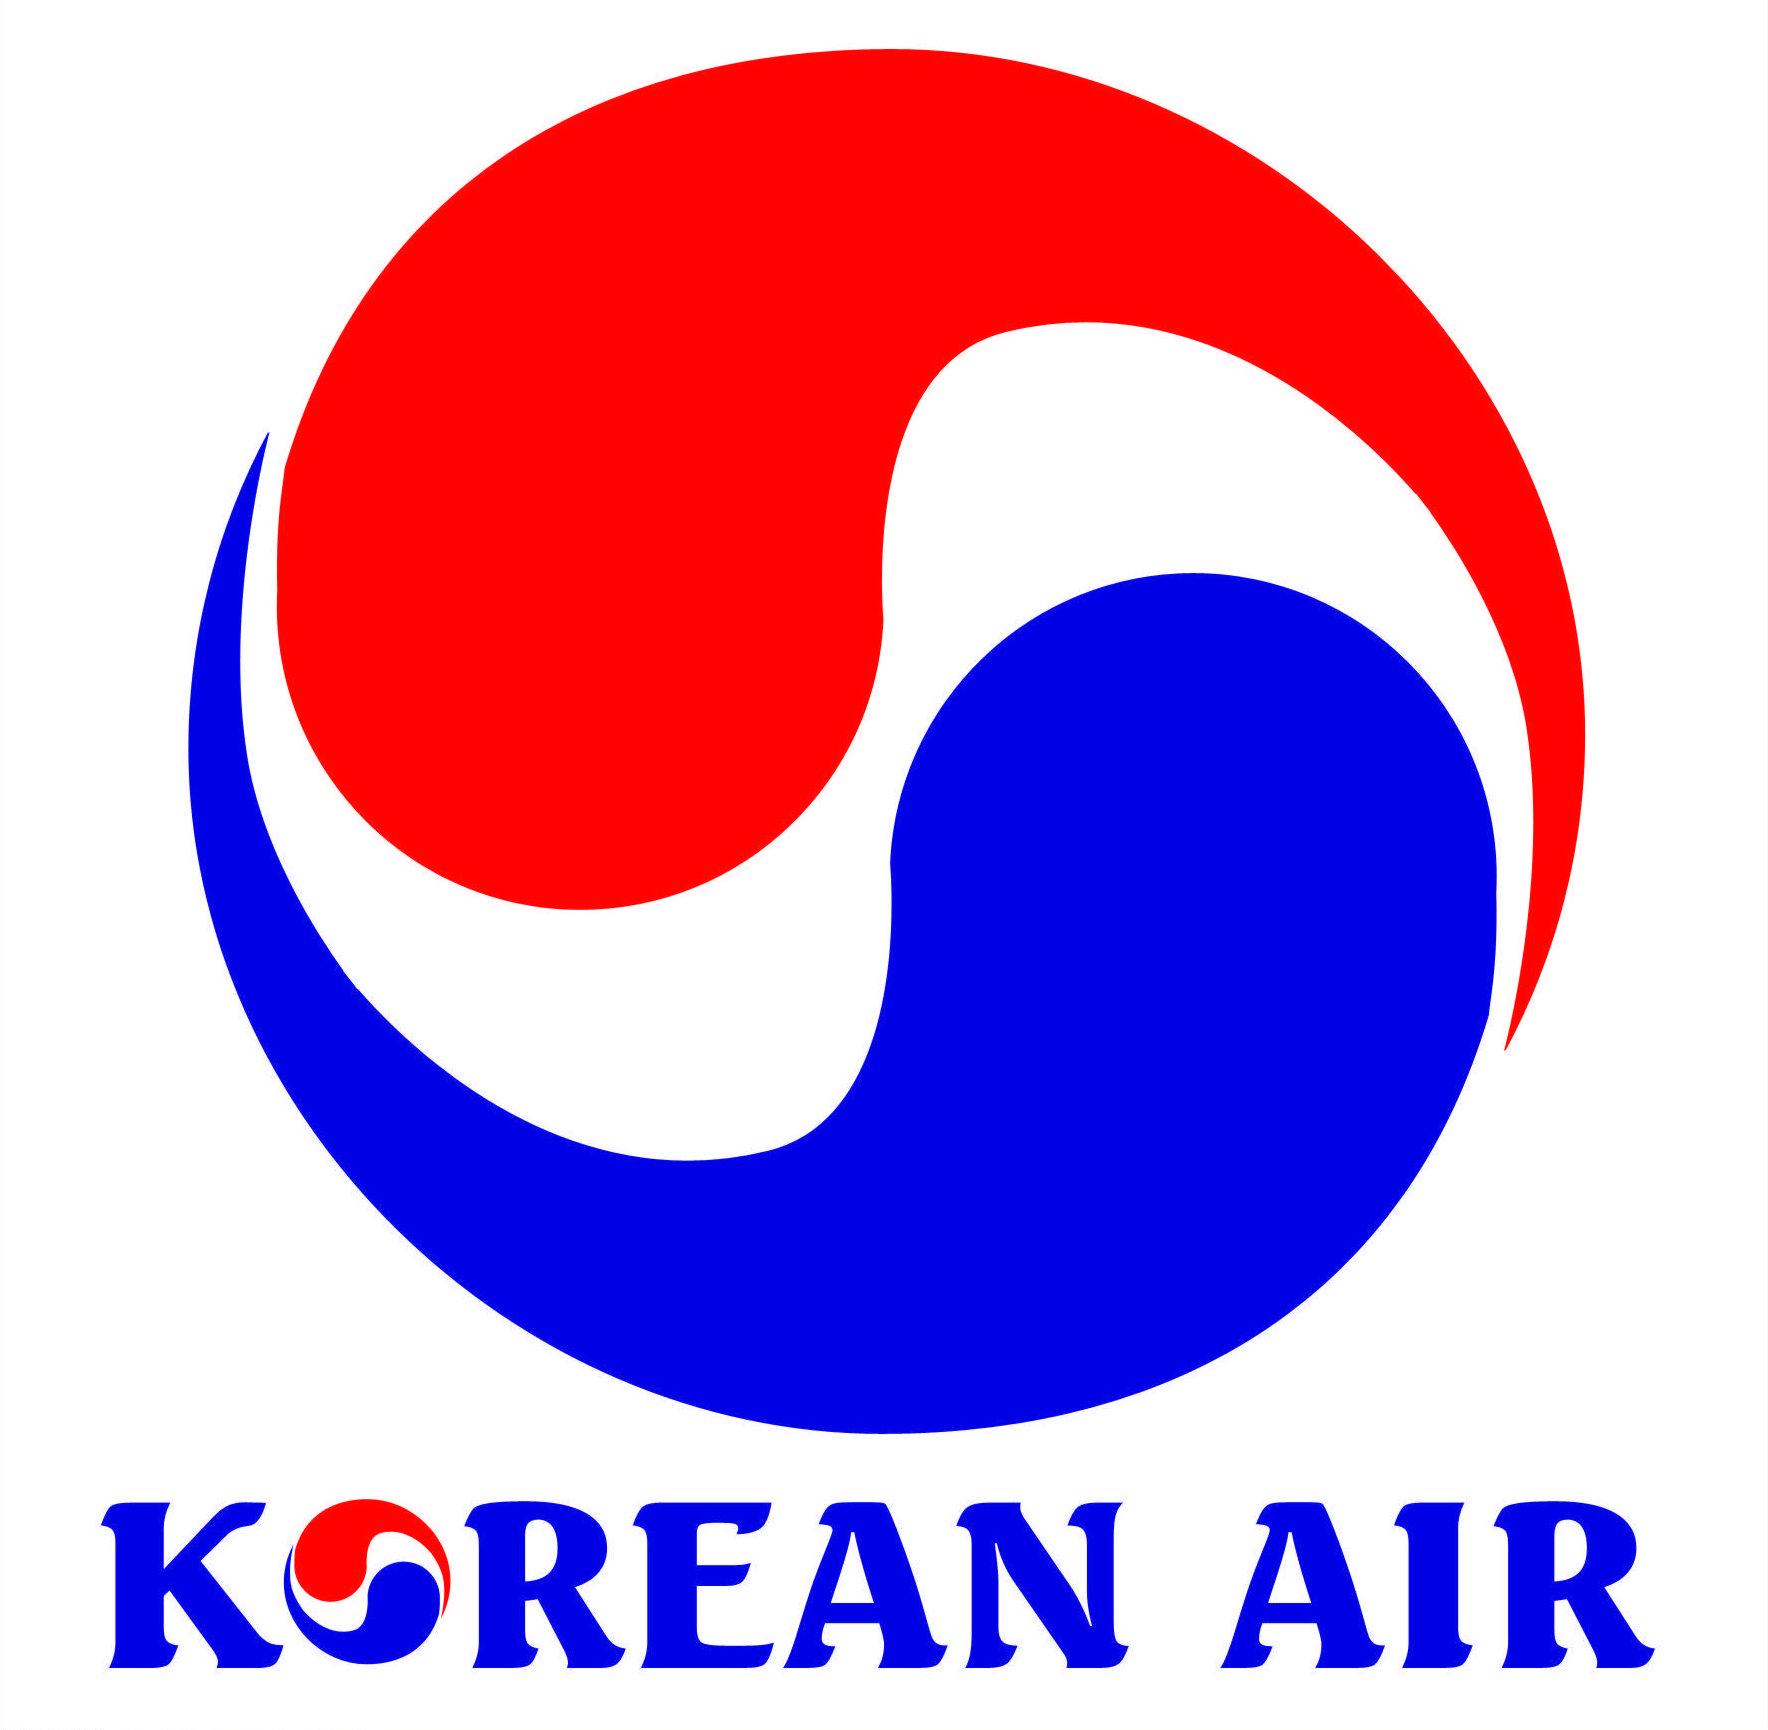 British Airways Logo photo - 1